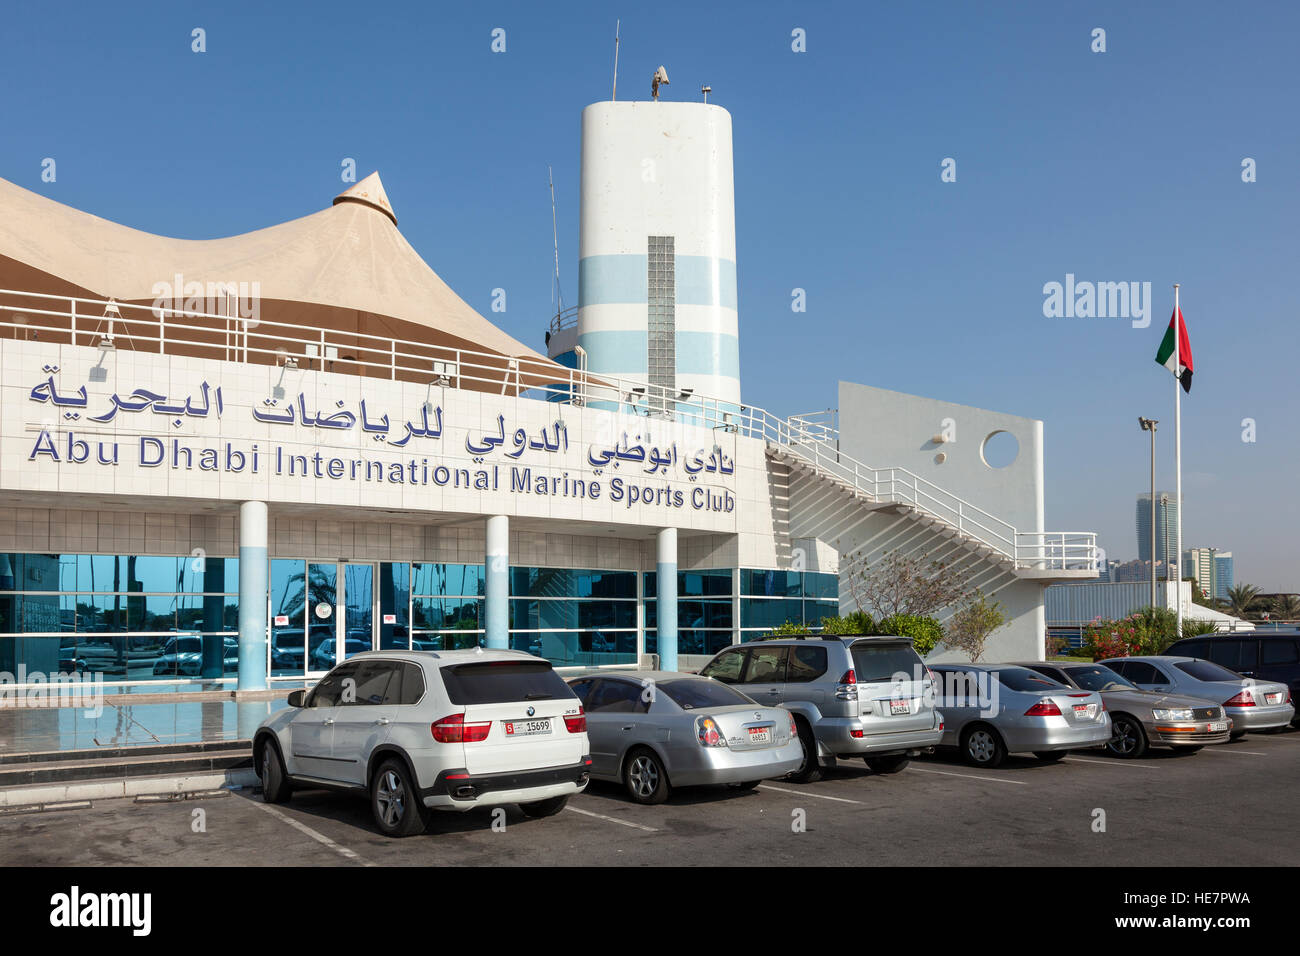 Abu Dhabi International Marine Sports Club - Stock Image